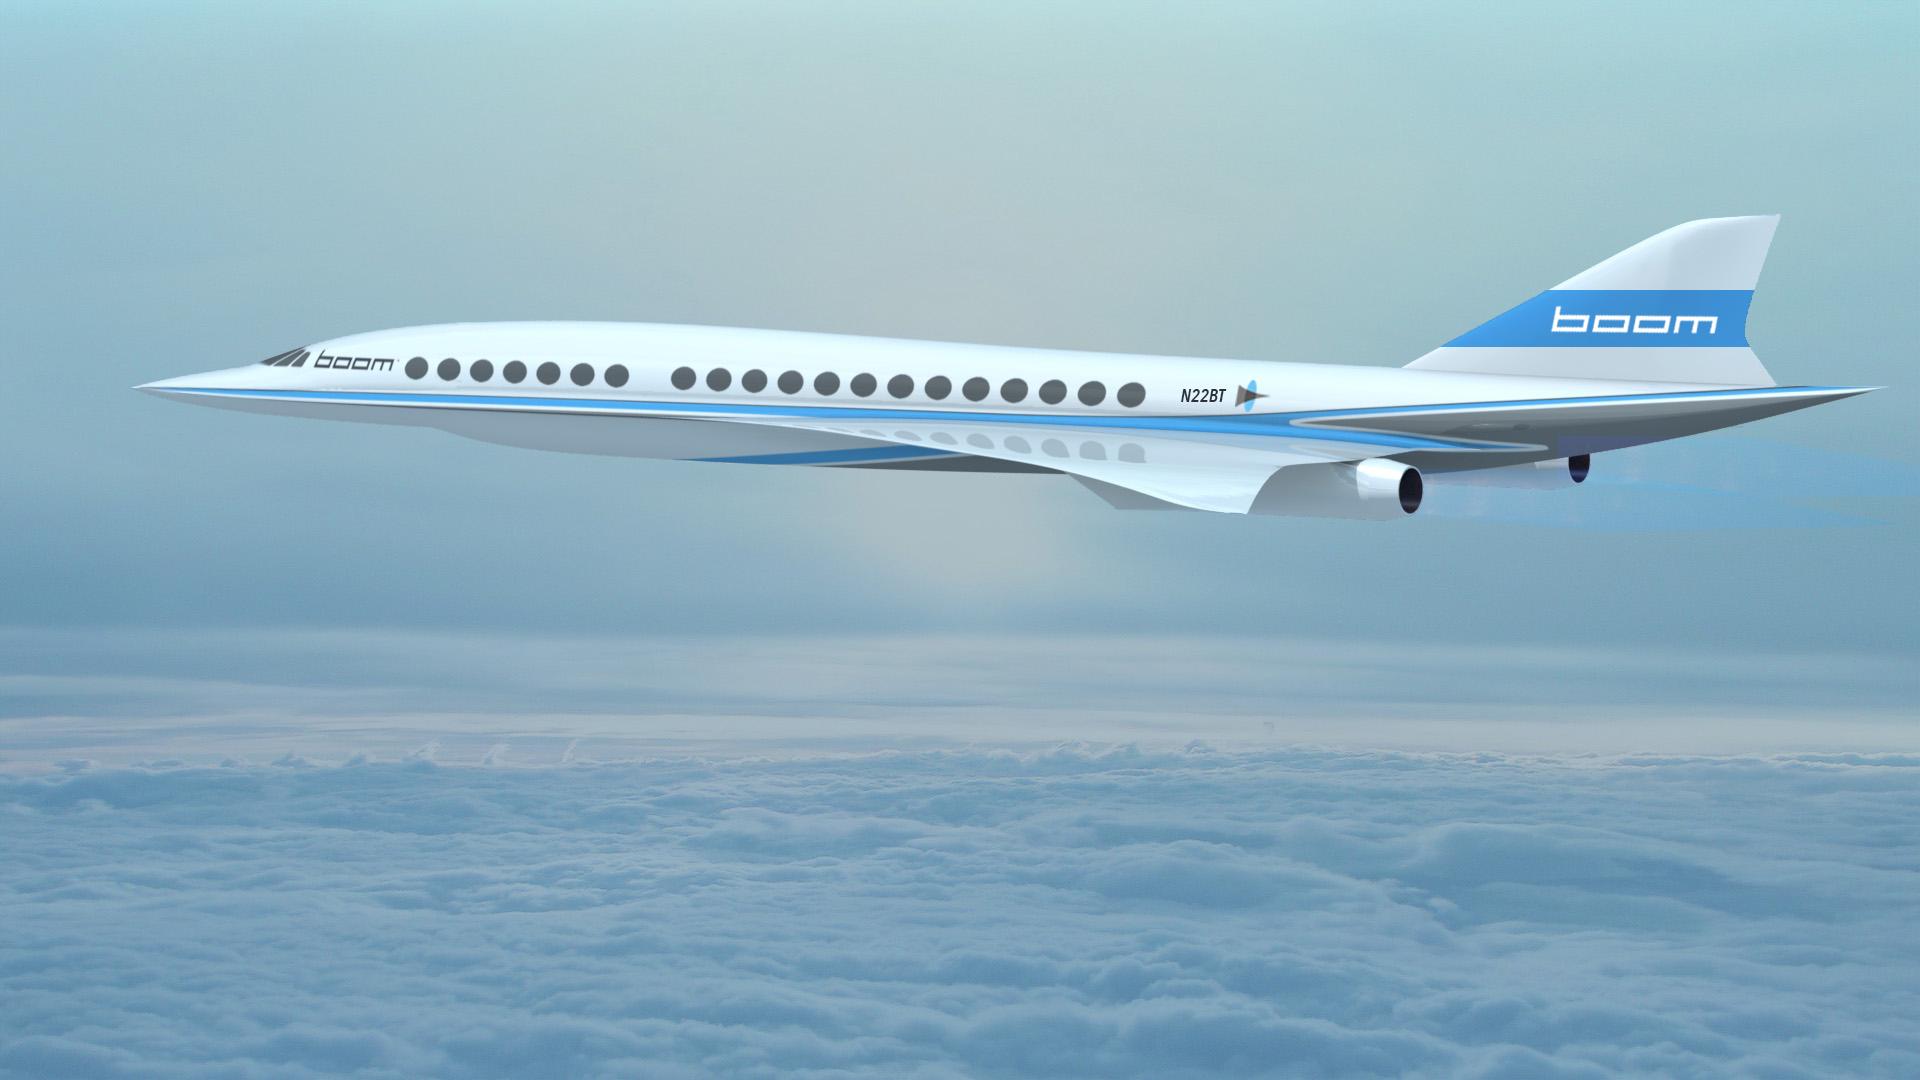 Boom's supersonic passenger jet